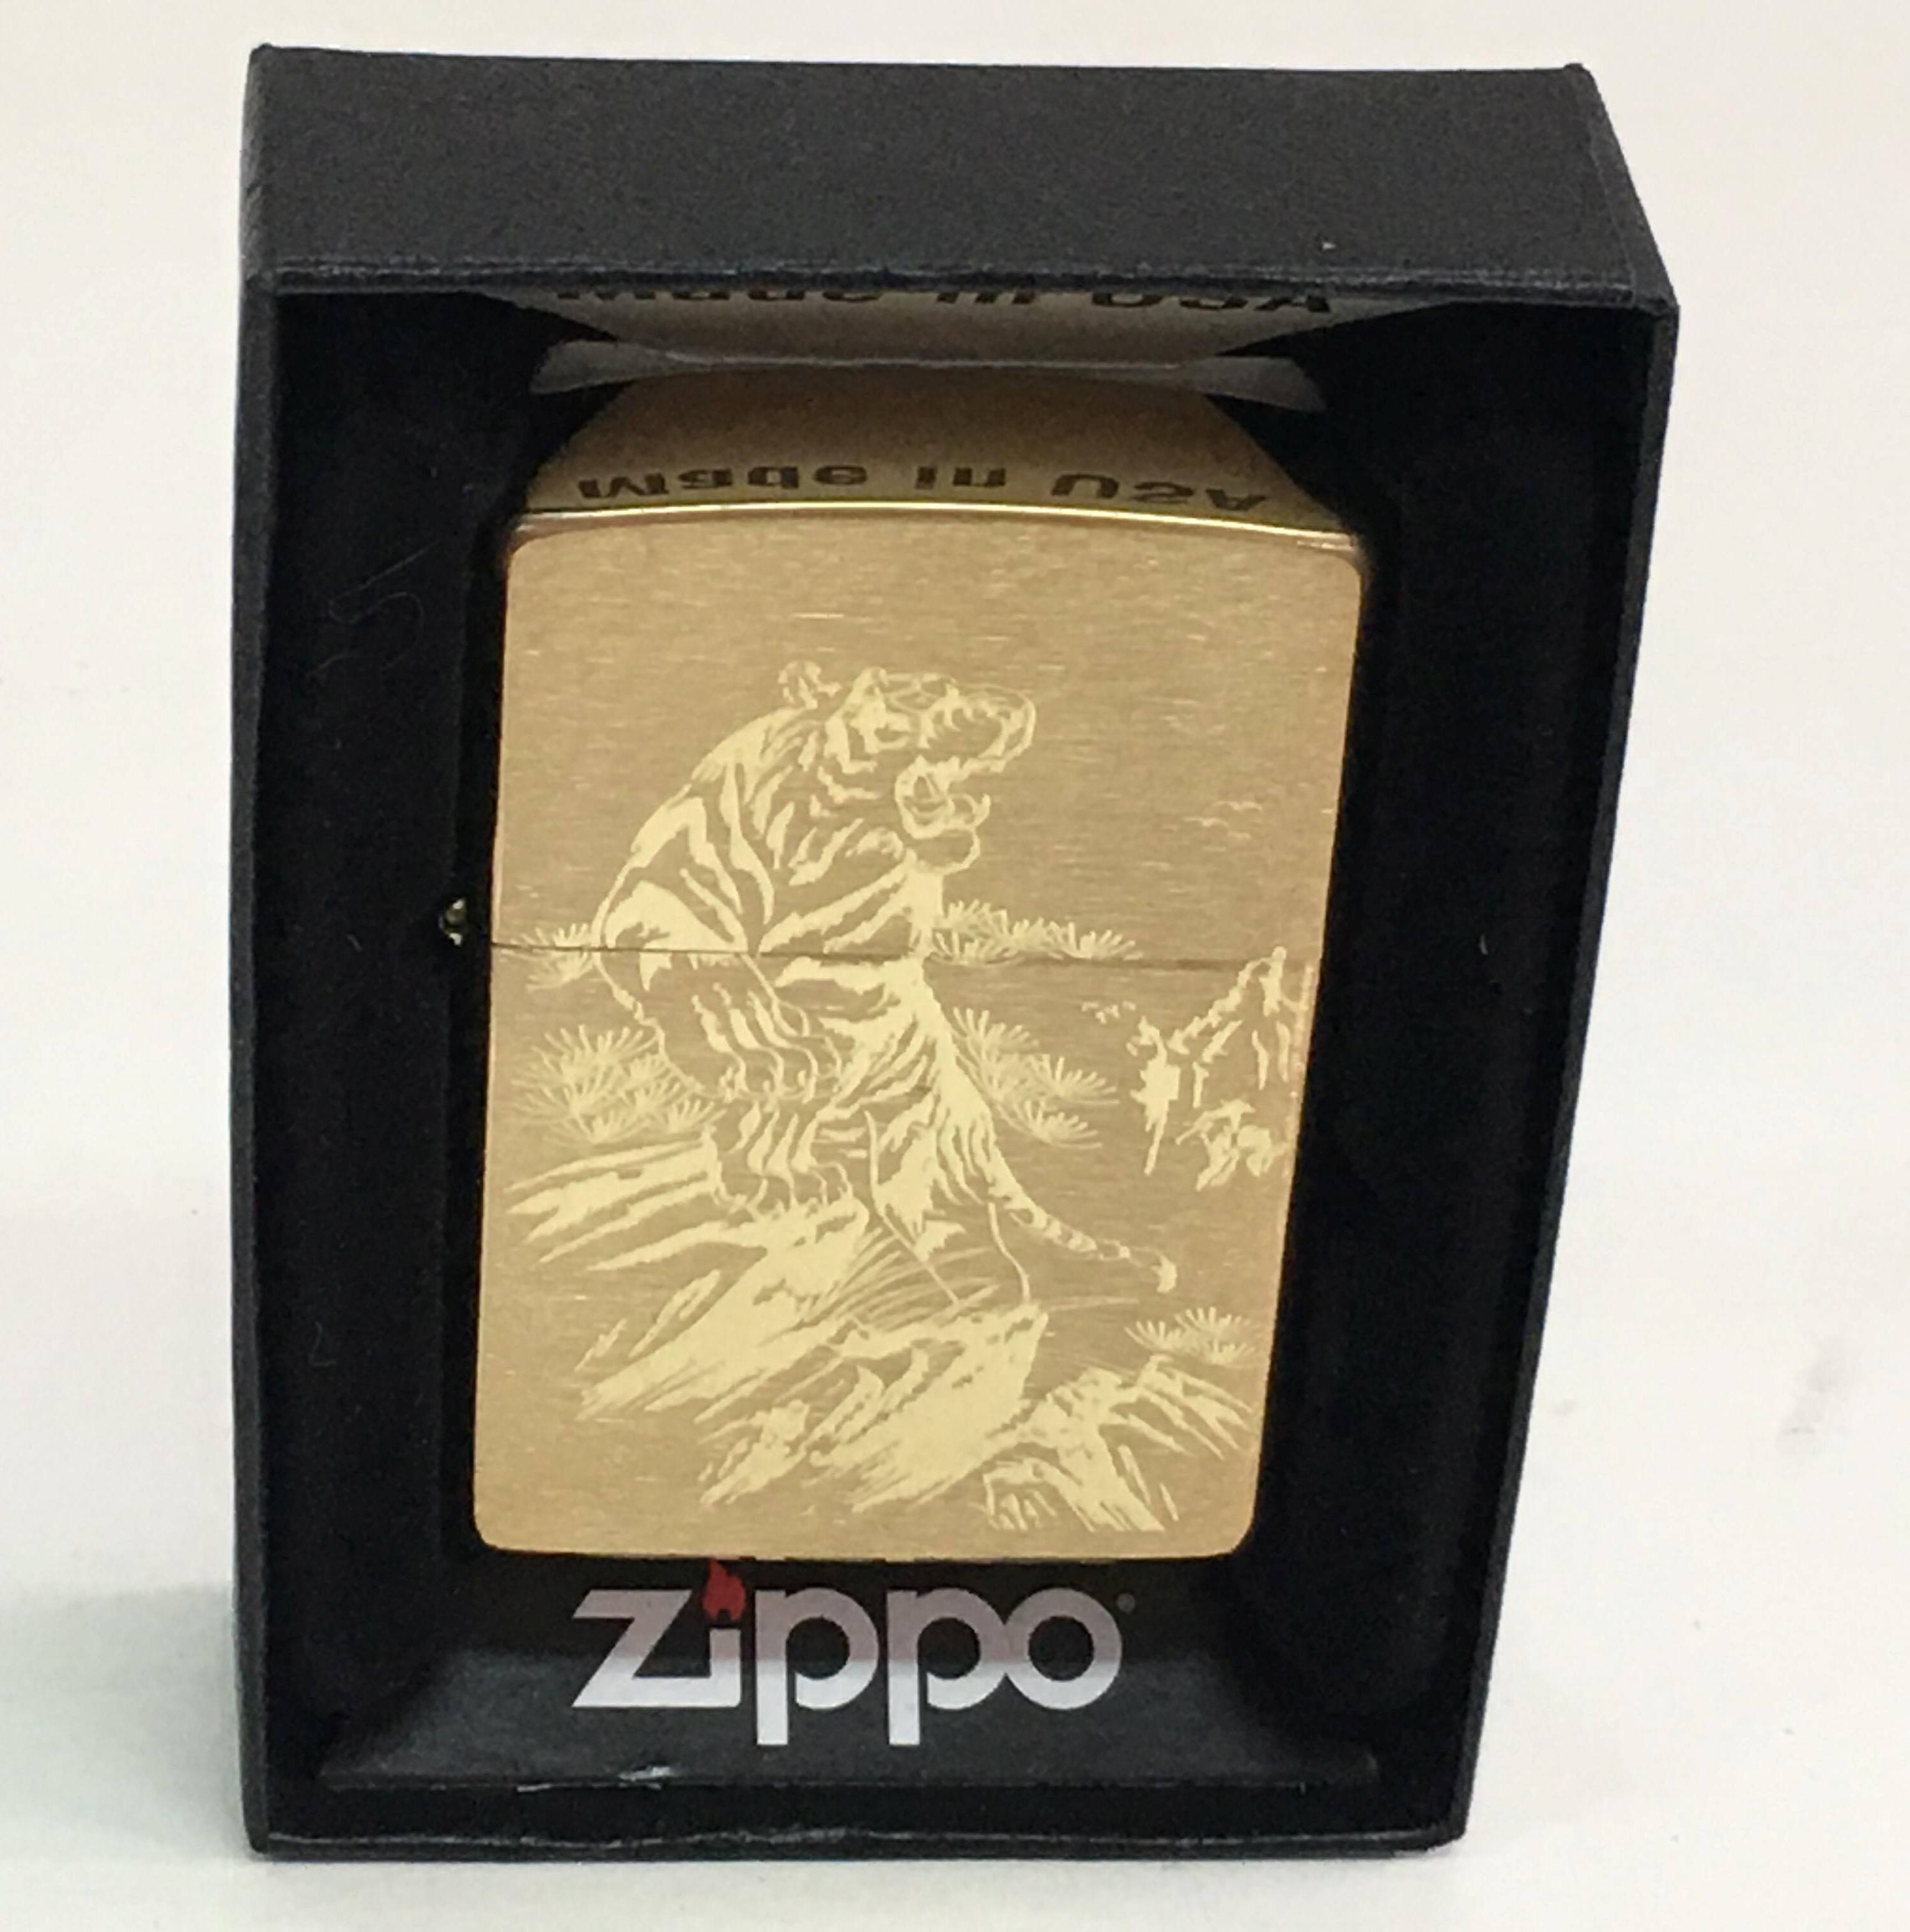 Zippo nham vang khac sieu sau 1 mat hinh con ho Z712 1